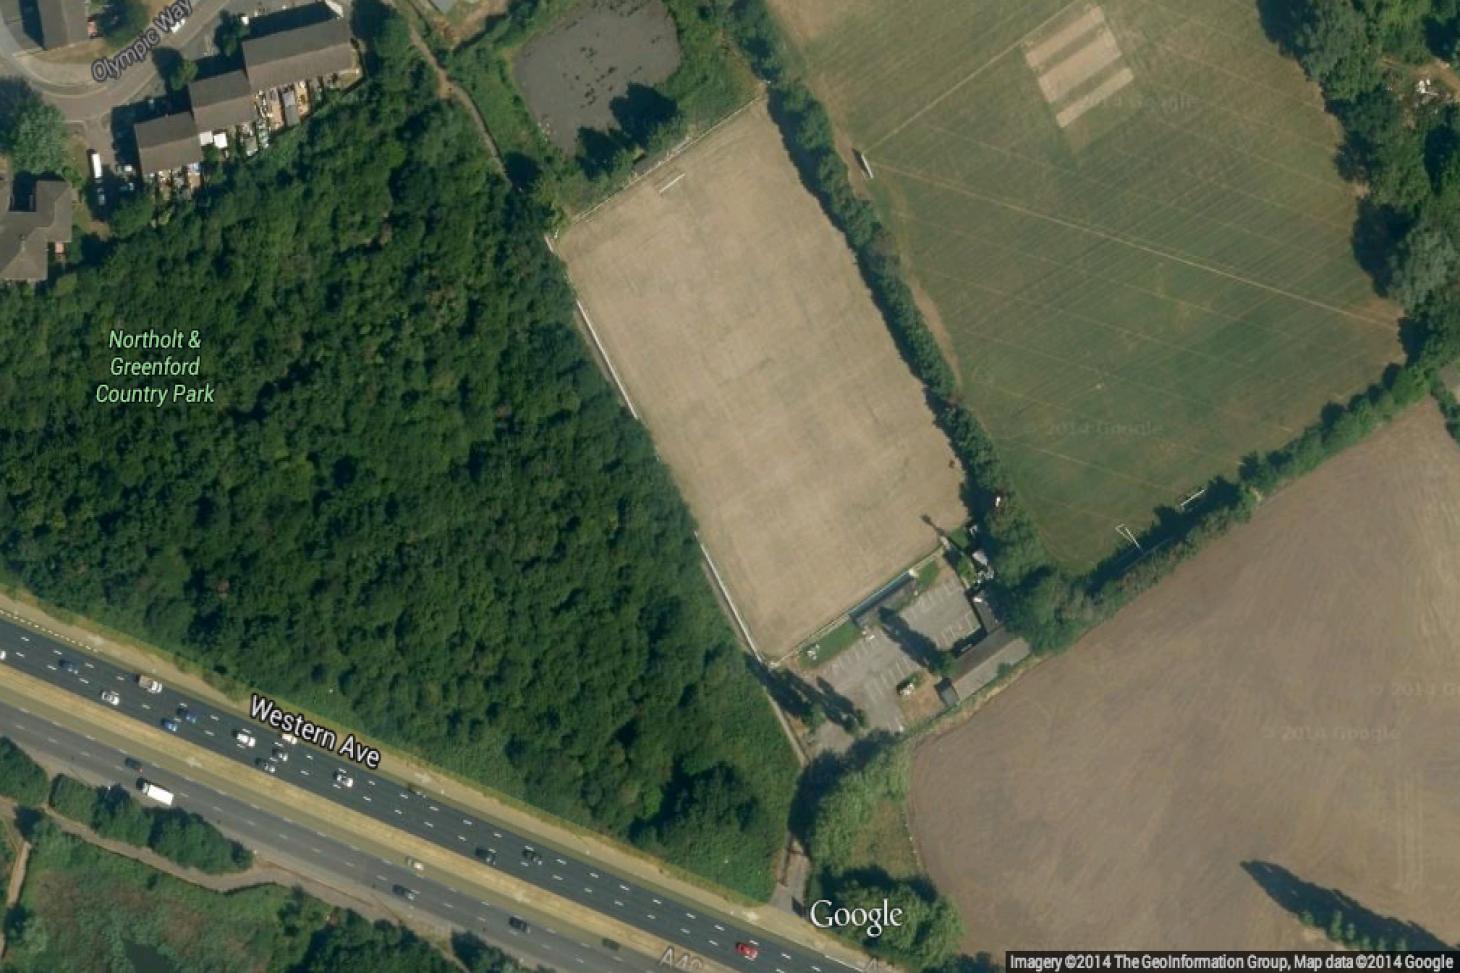 London Marathon Playing Fields - Greenford 11 a side | Grass football pitch